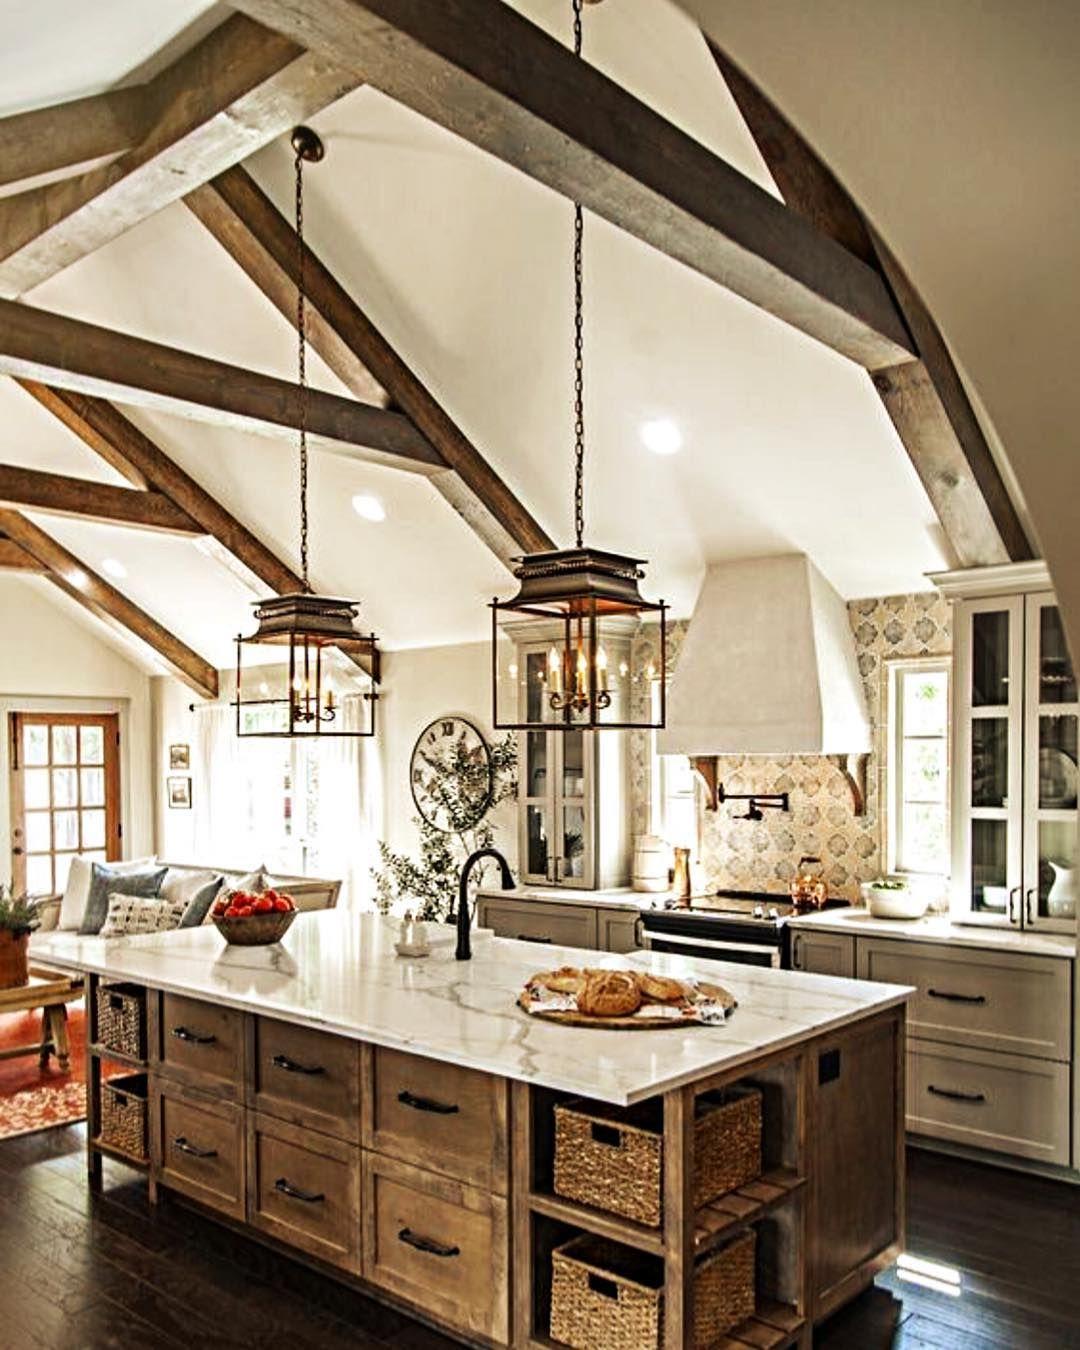 33 Modern Style Cozy Wooden Kitchen Design Ideas: Lola_moonnLove This Rustic Italian Style Kitchen With